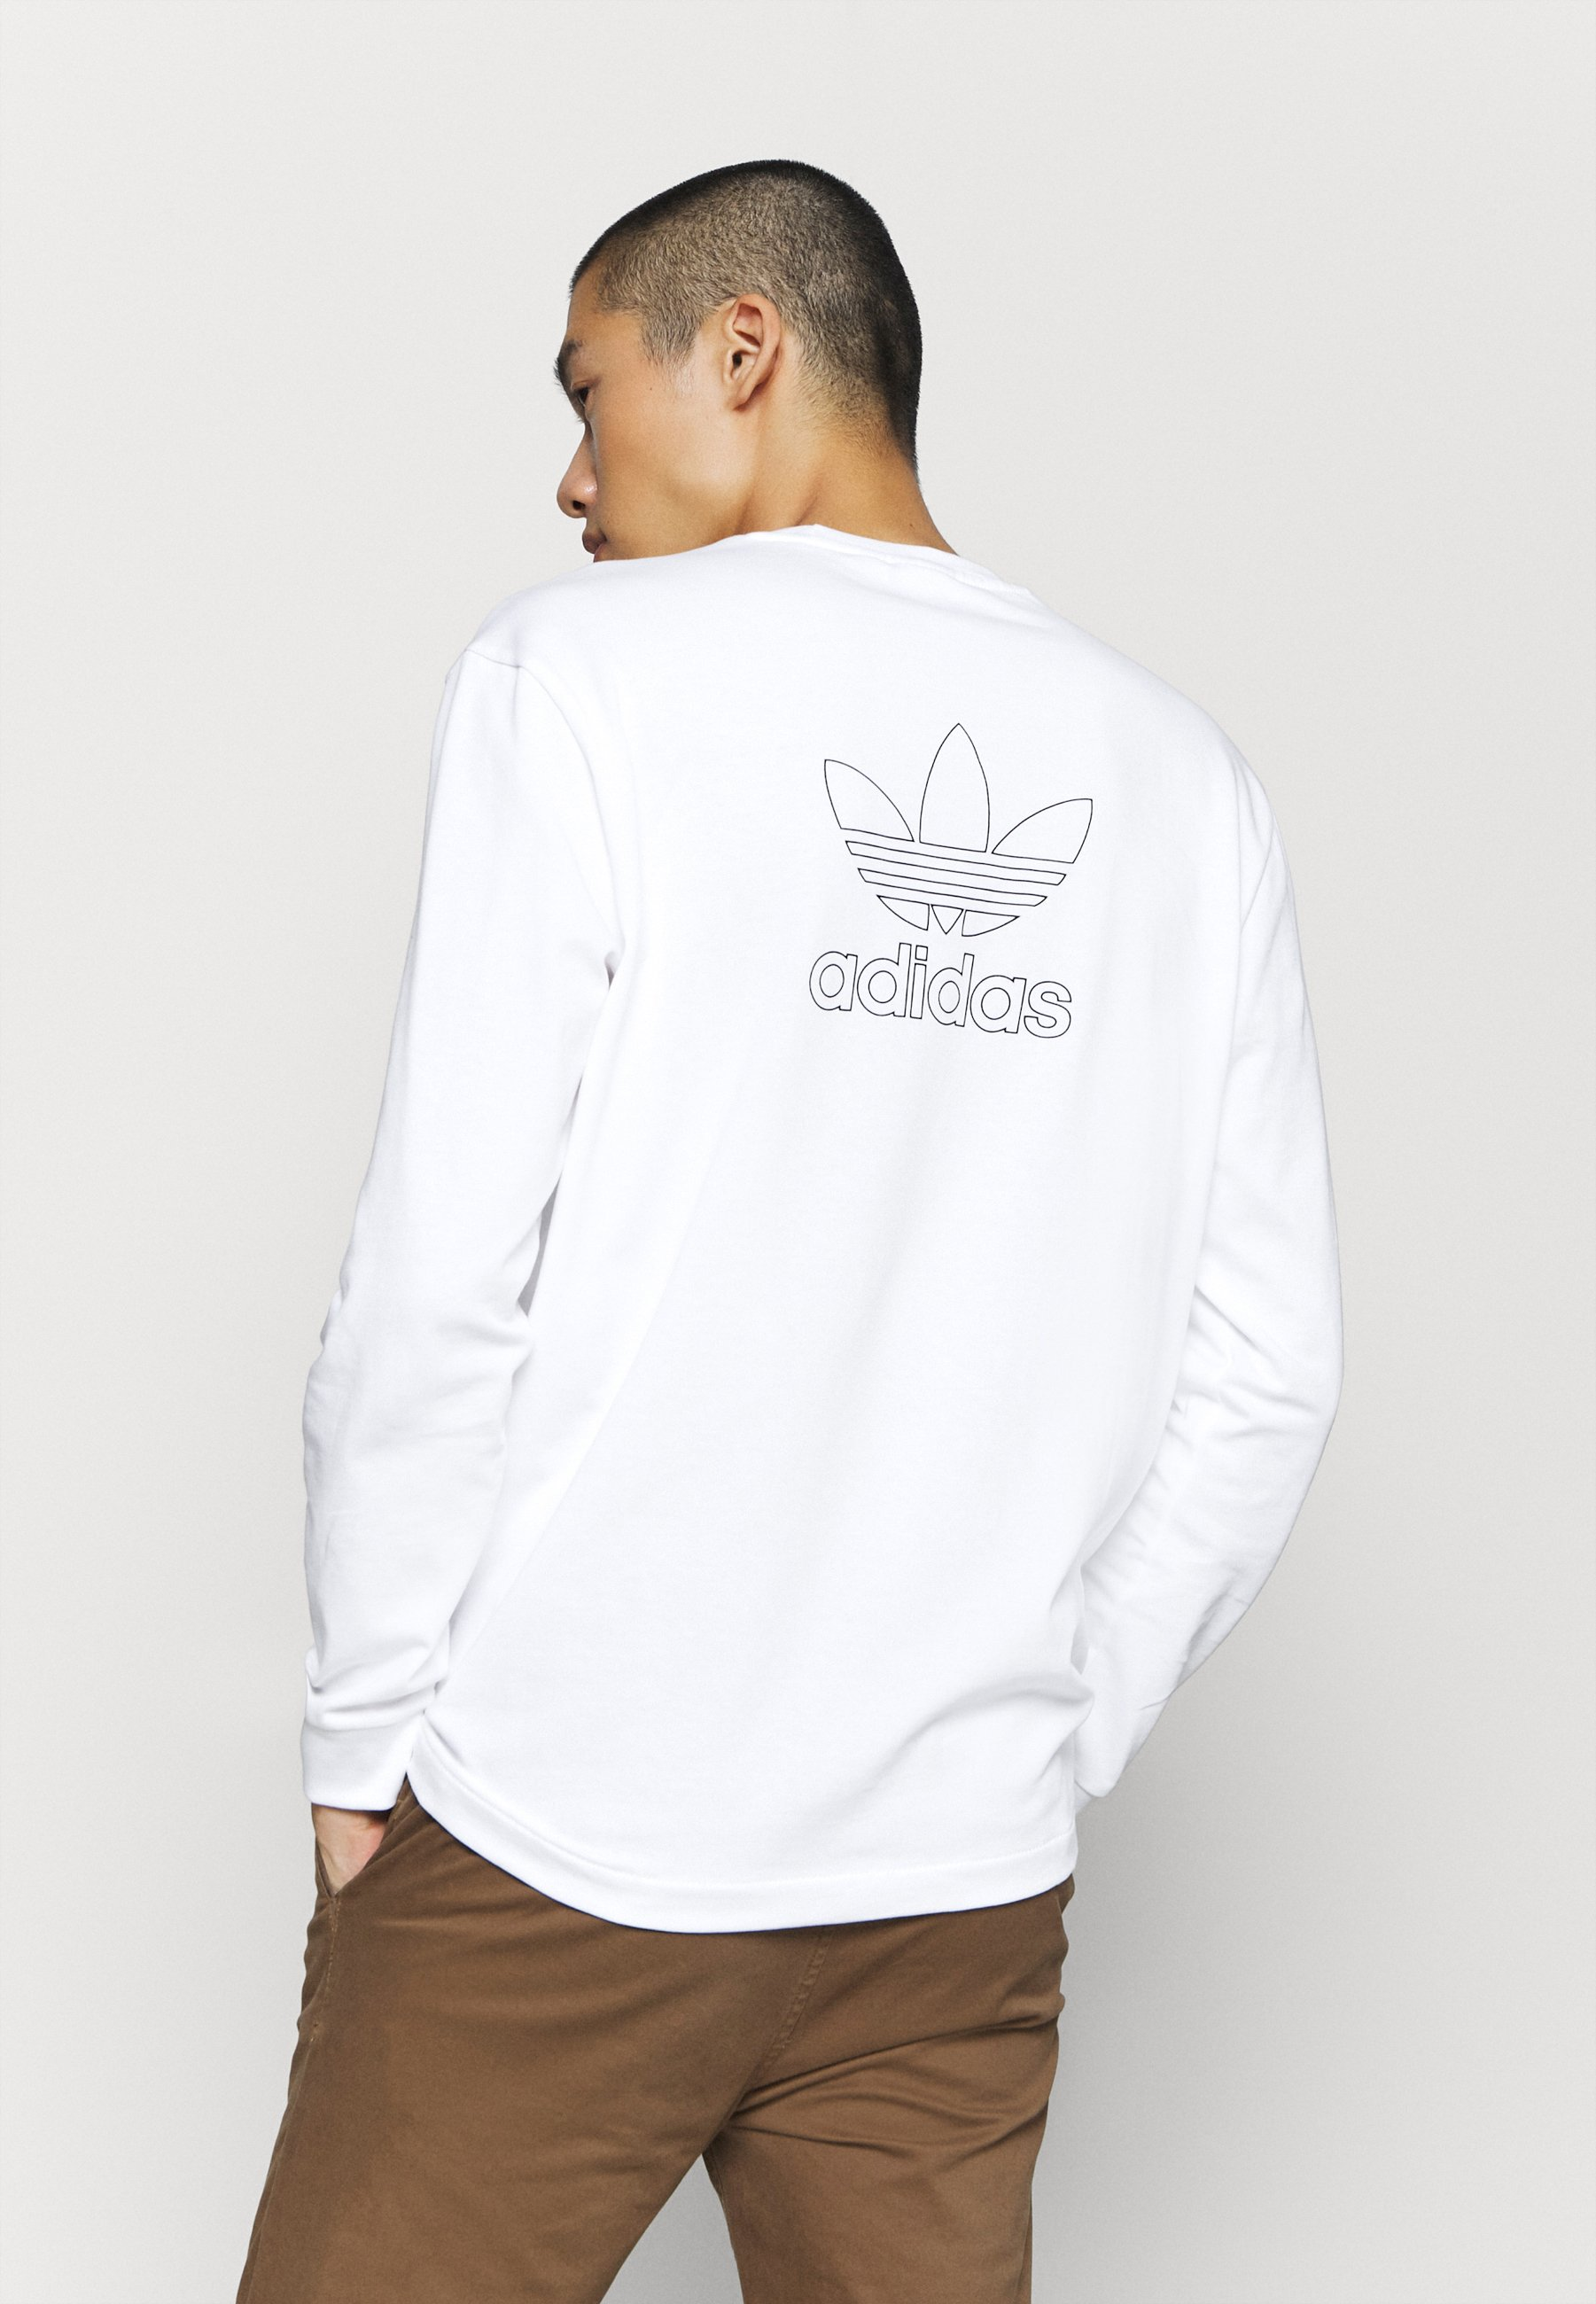 Adidas Originals Topper Langermet - White/black/hvit